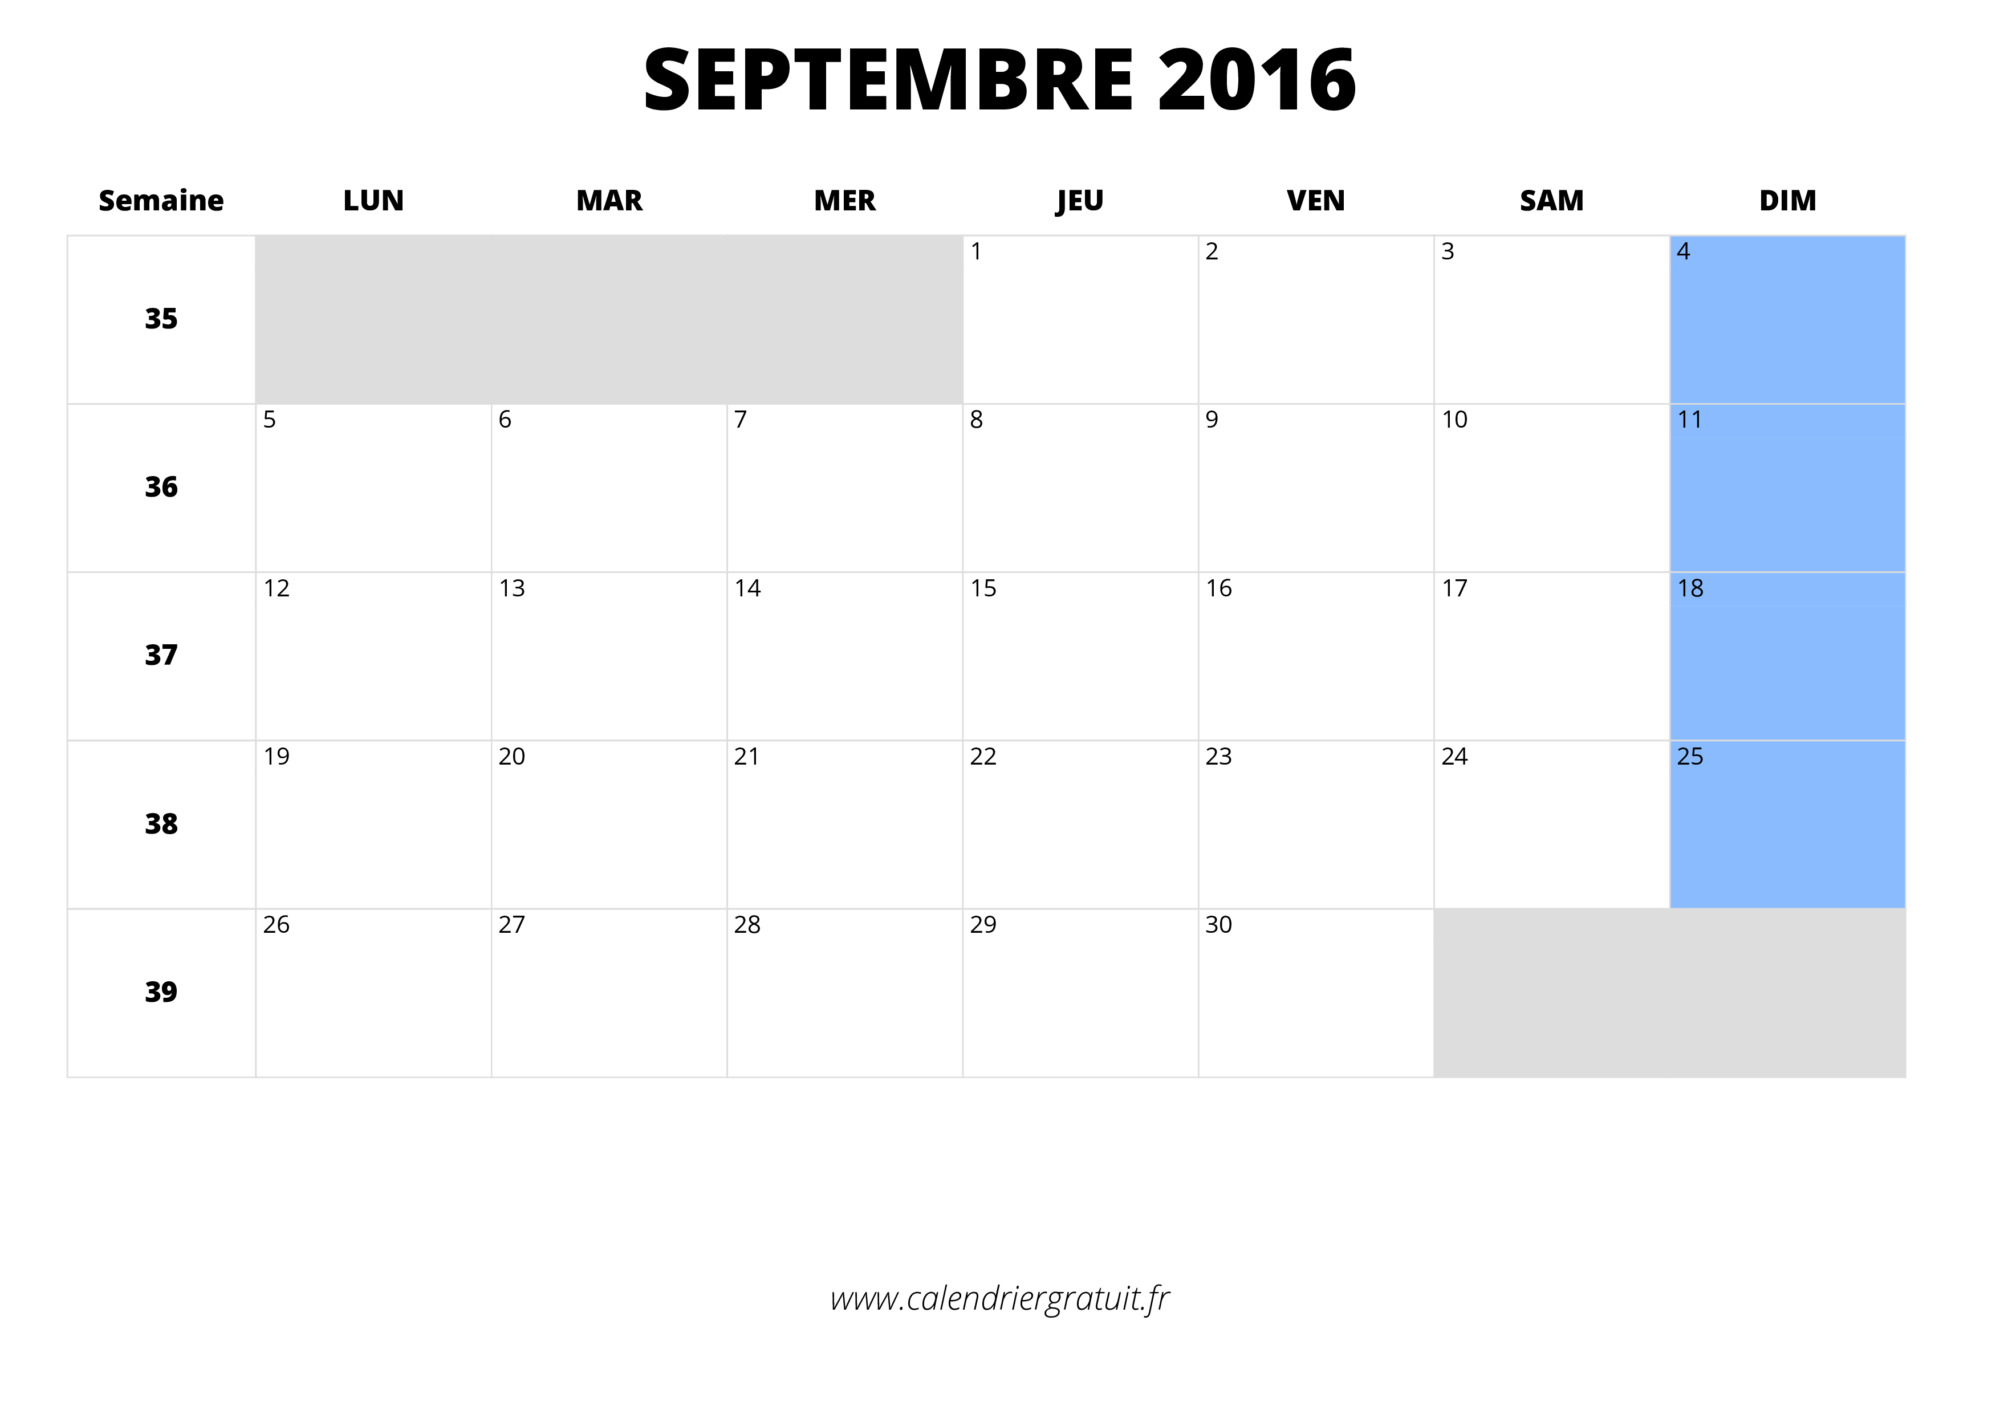 Calendrier septembre 2016 imprimer - Calendrier lunaire septembre 2016 ...